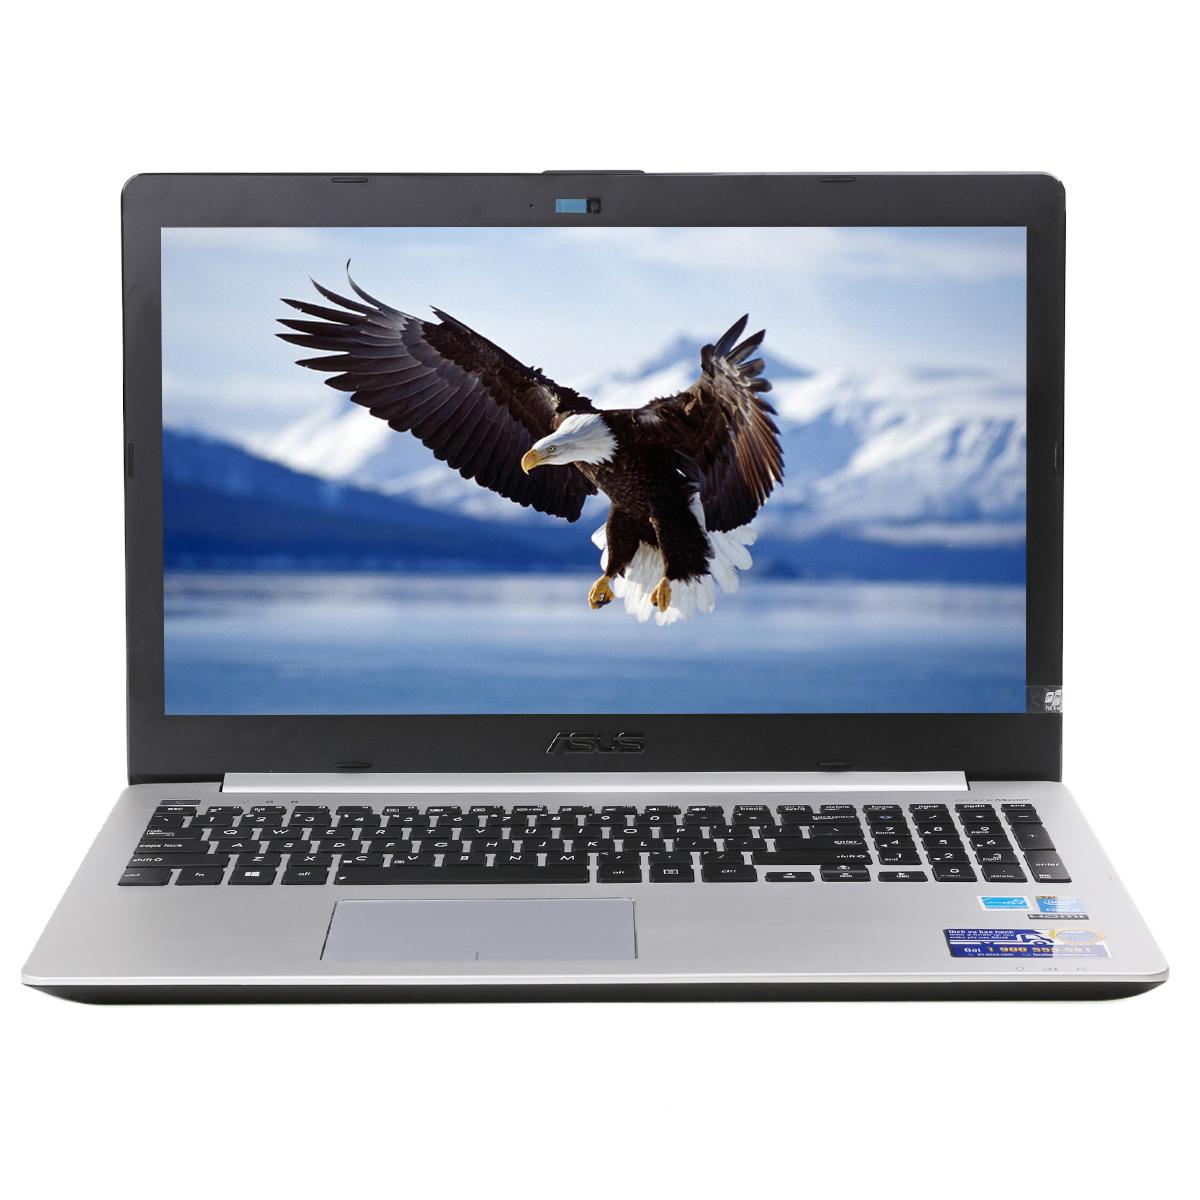 Laptop Asus  K555LA-XX1086D Core i5-5200U 2.2Ghz/4GB/500GB/15.6